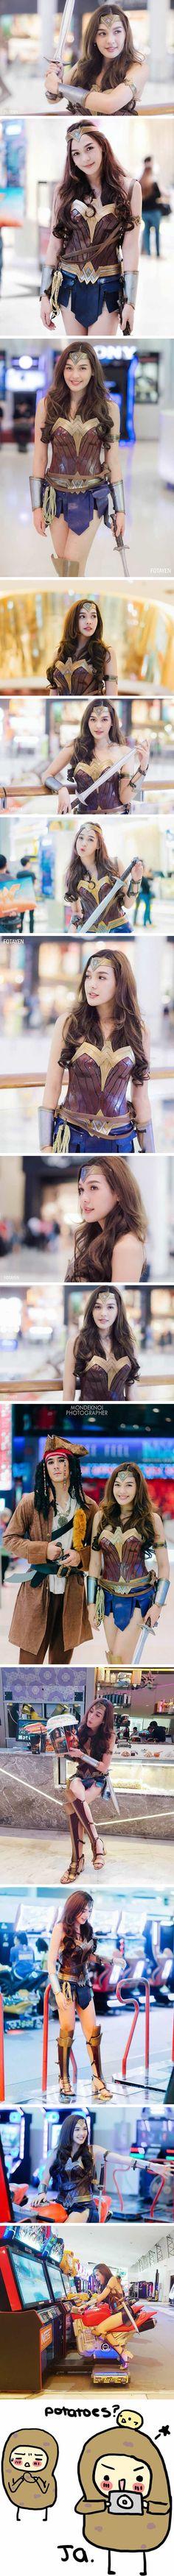 Stunning Wonder Woman cosplay will make you fall in love with Diana: Please meet Pichyada Chatlkamjaroen (Rae)